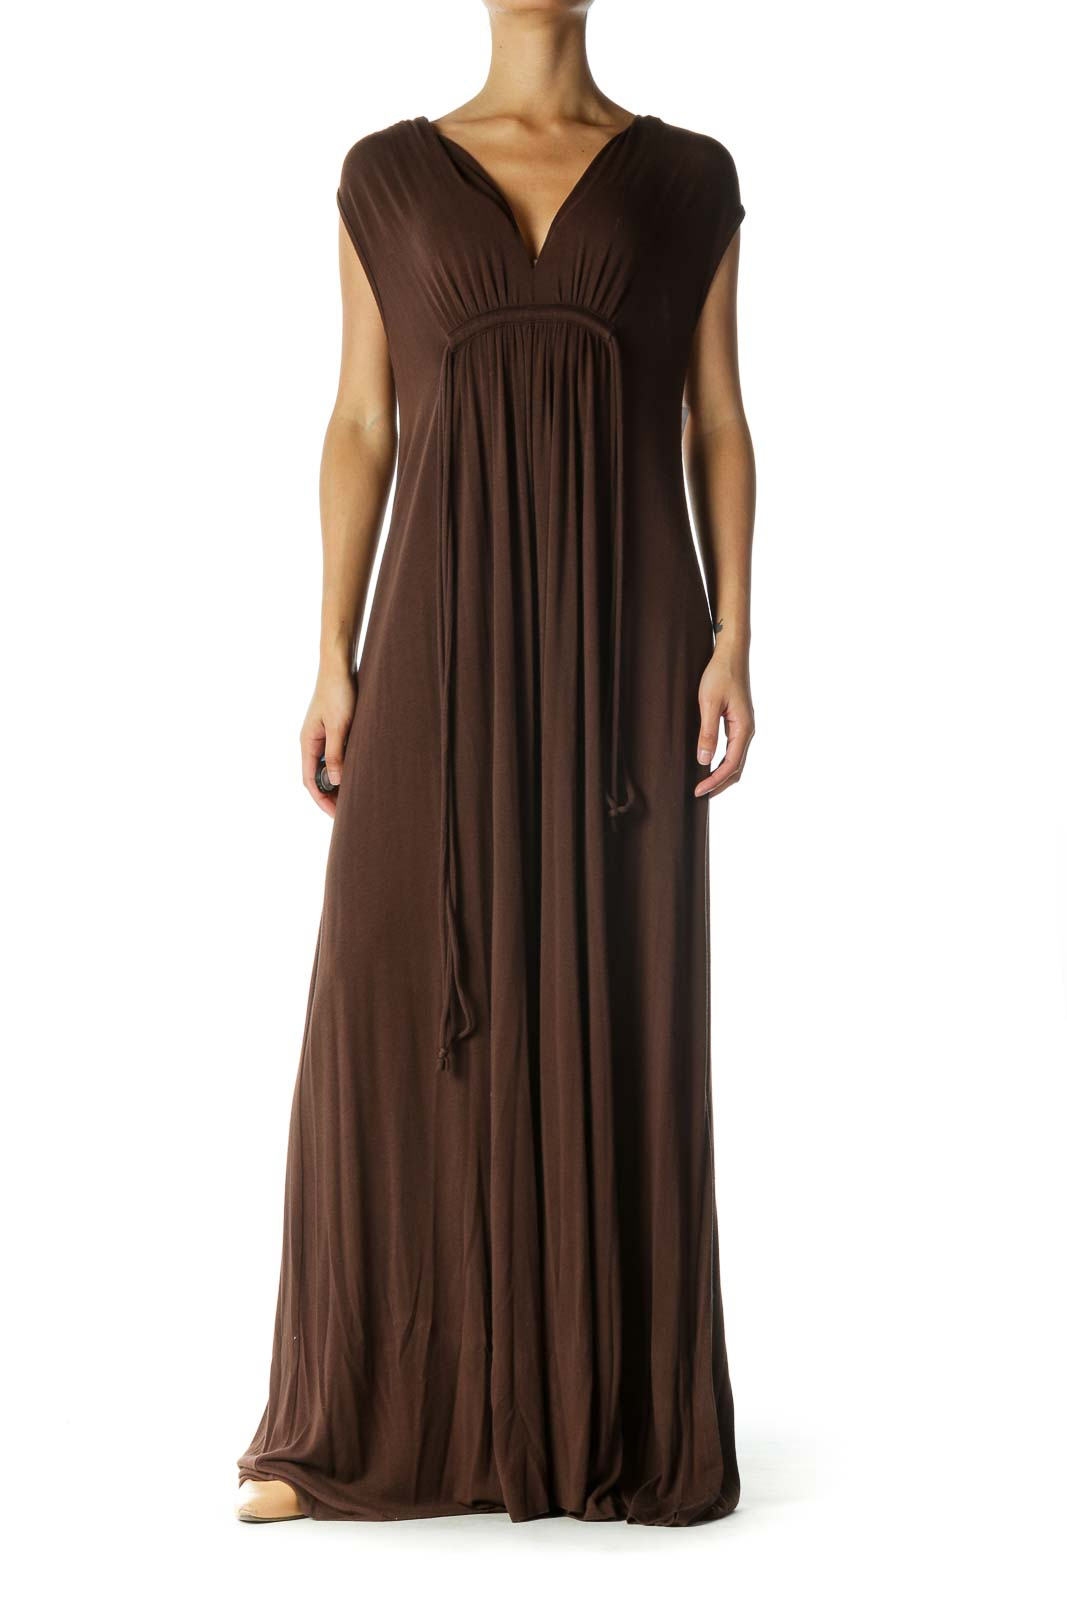 Brown Sleeveless Maxi Dress